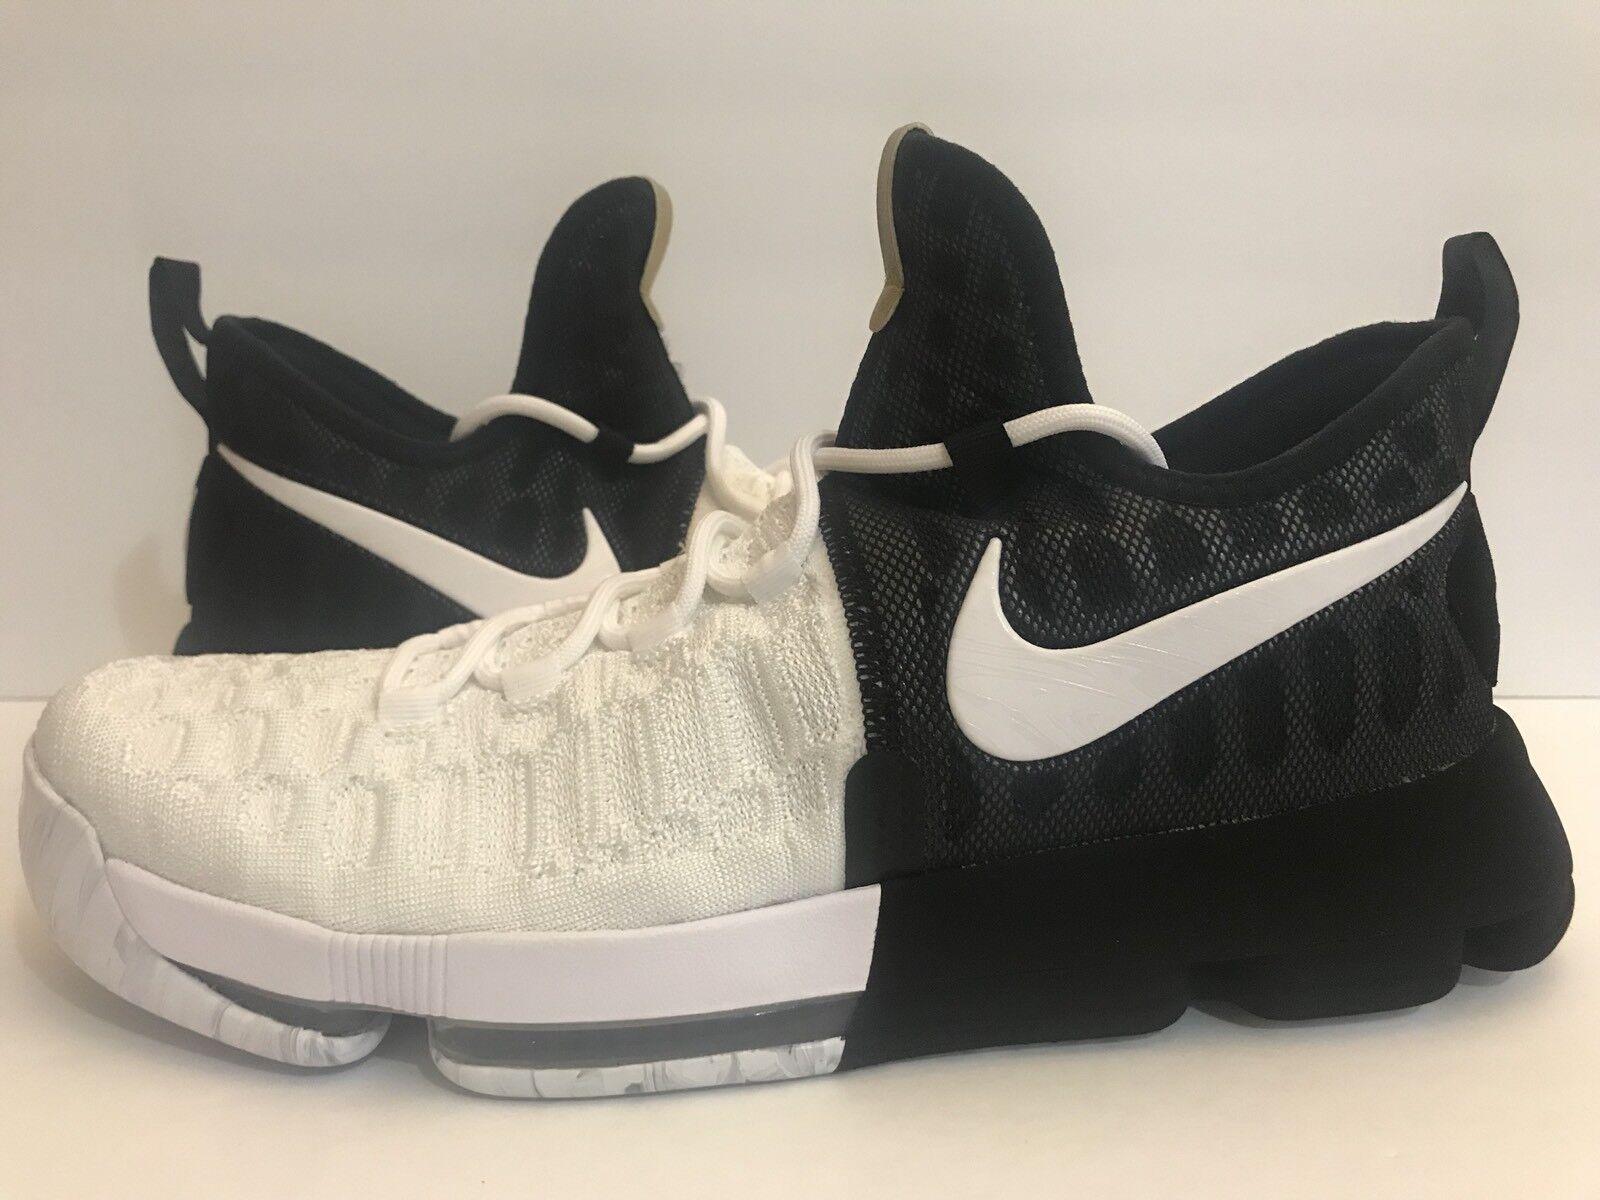 Nike zoom kd9 bhm limitata nero history month nero / bianco 860637-100 sz